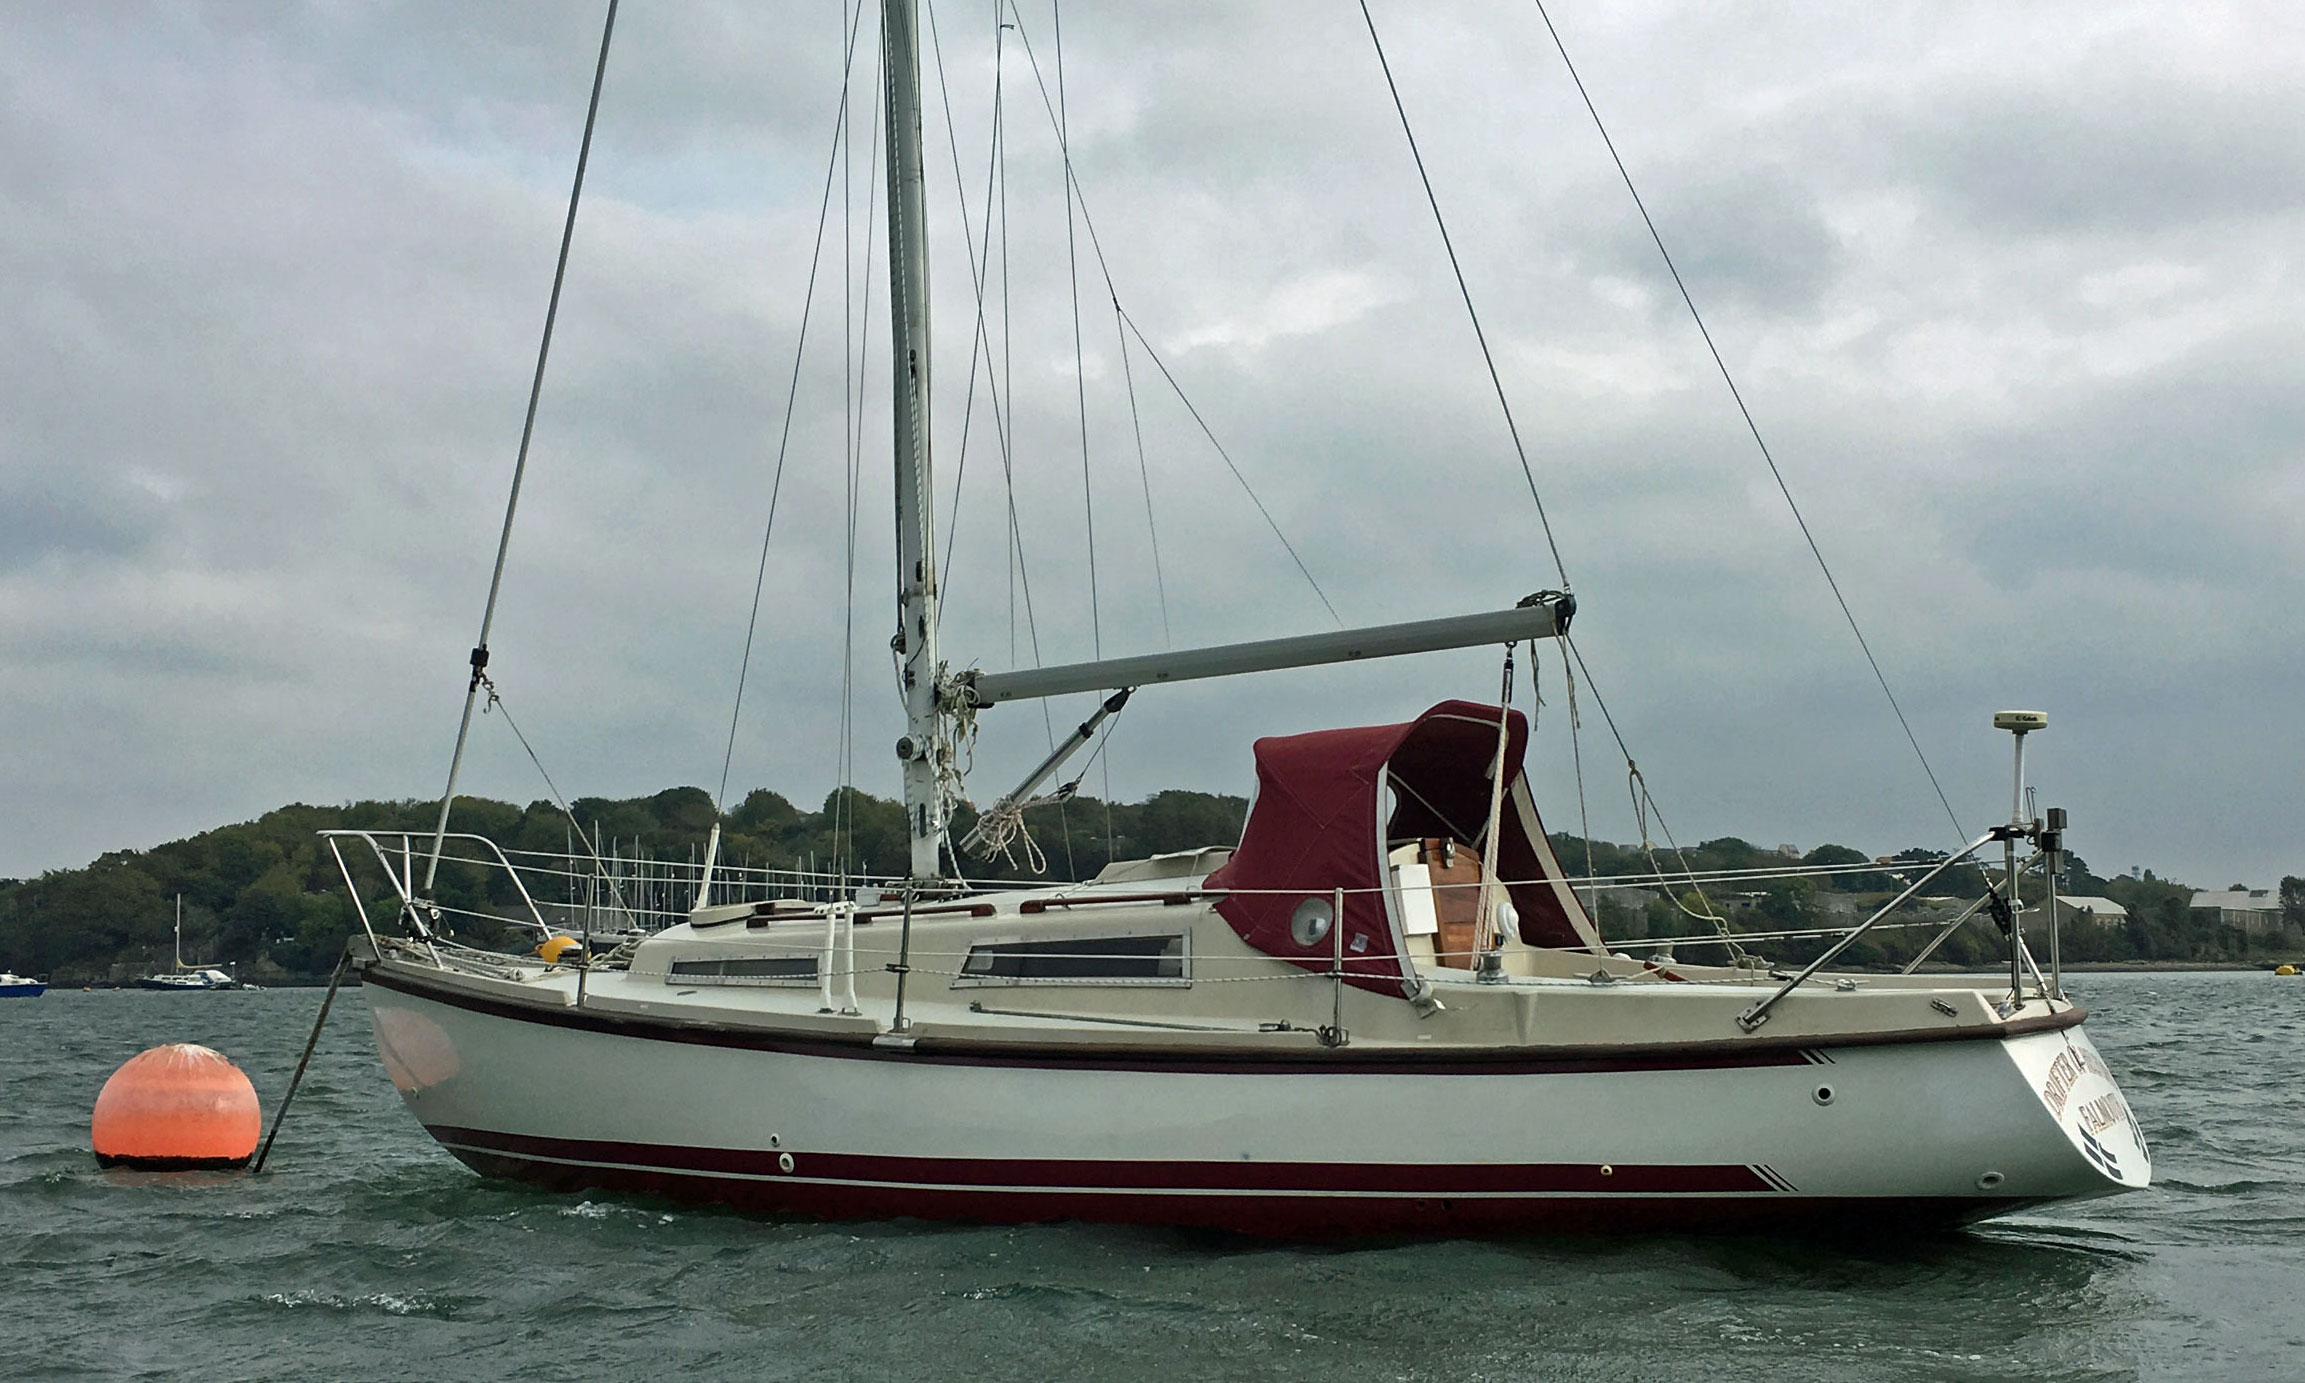 A moored Phillipa 27 sailboat